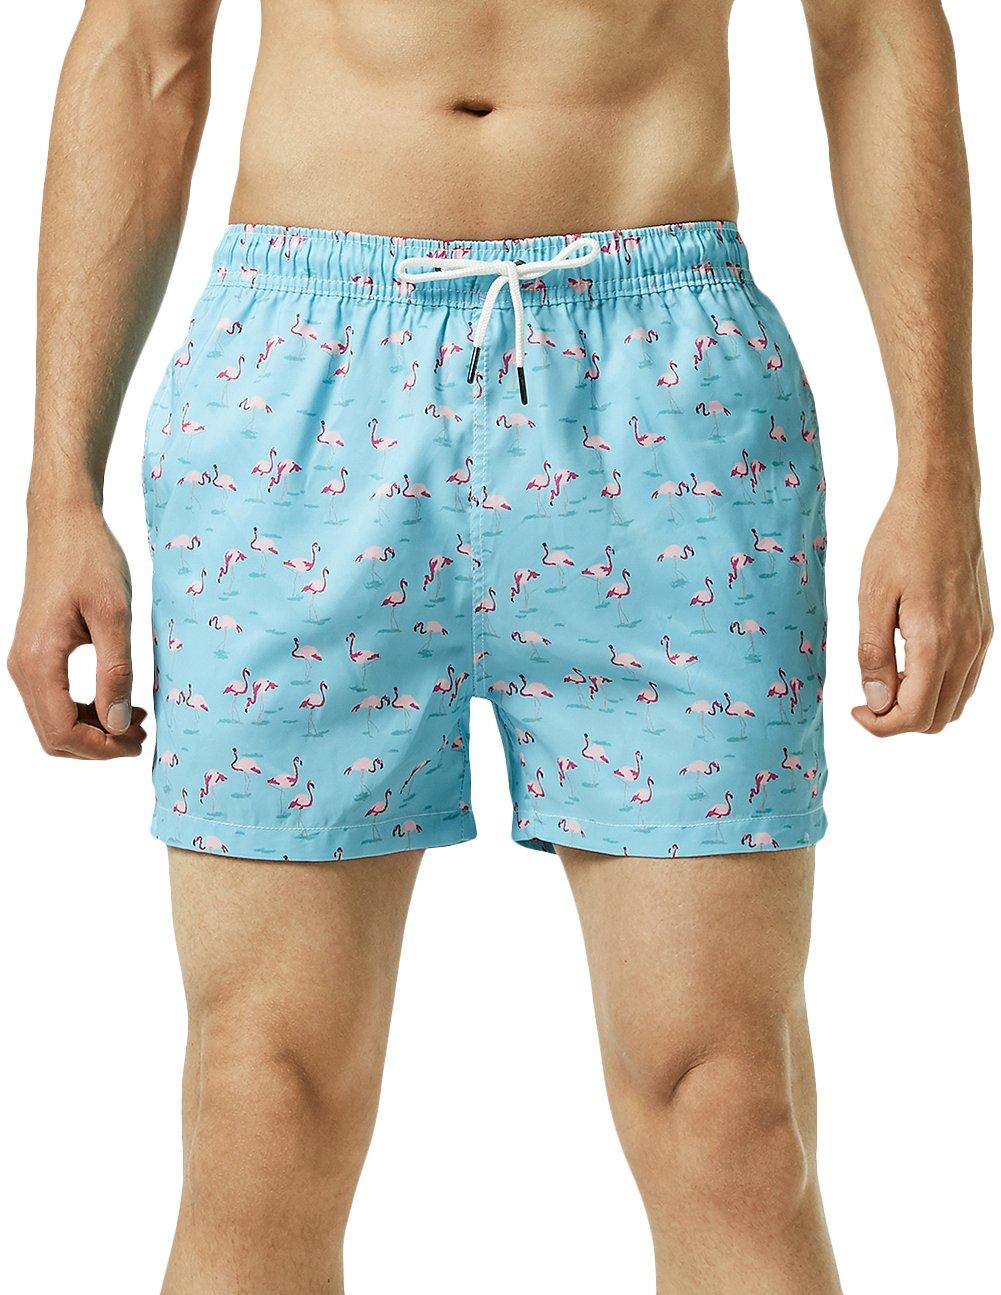 e3e5d1b1f371c Galleon - MaaMgic Mens Quick Dry Printed Short Swim Trunks With Mesh Lining  Swimwear Bathing Suits